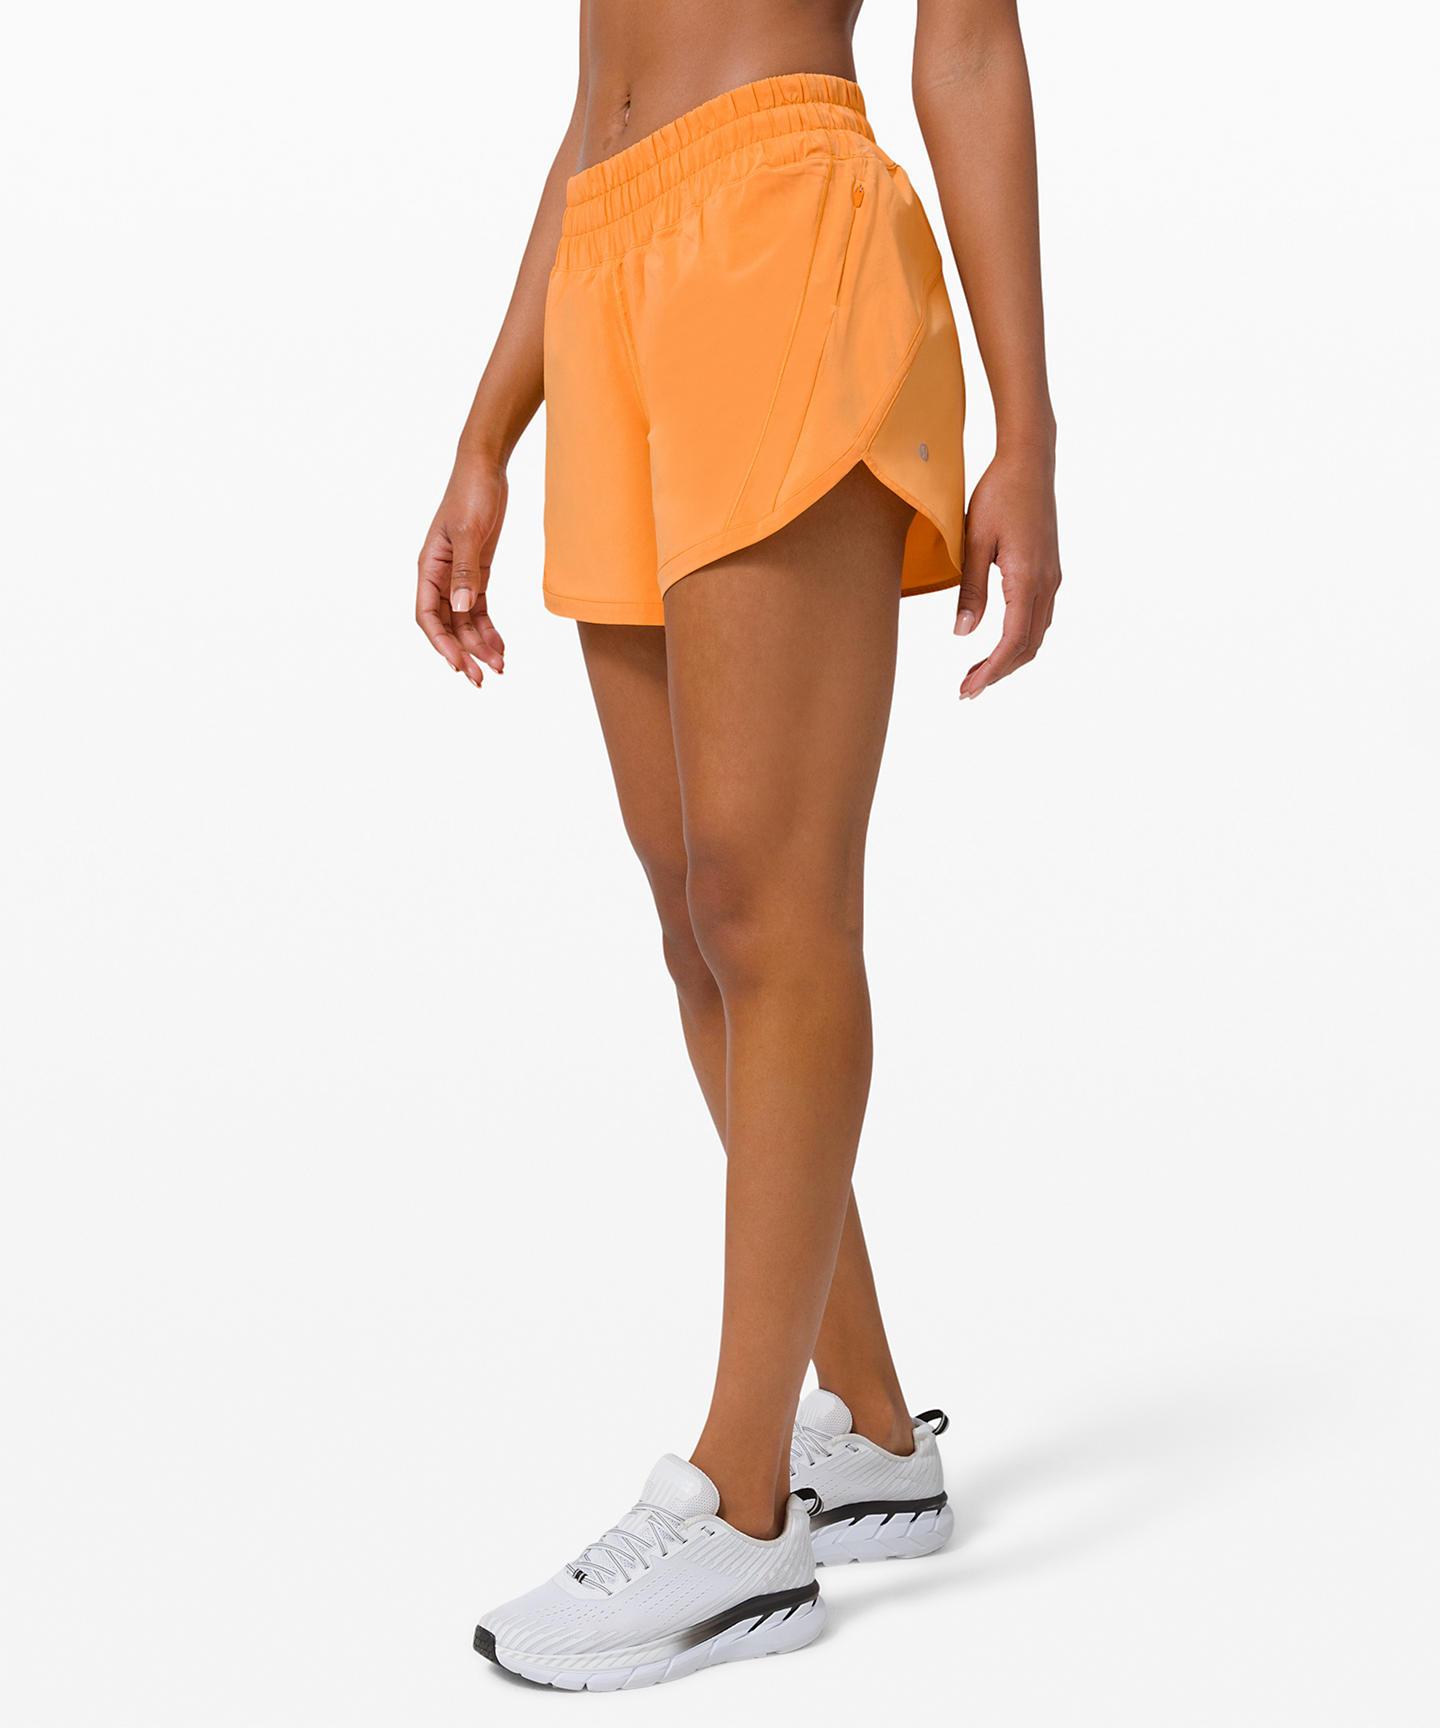 Lululemon Upload Featuring Monarch Orange